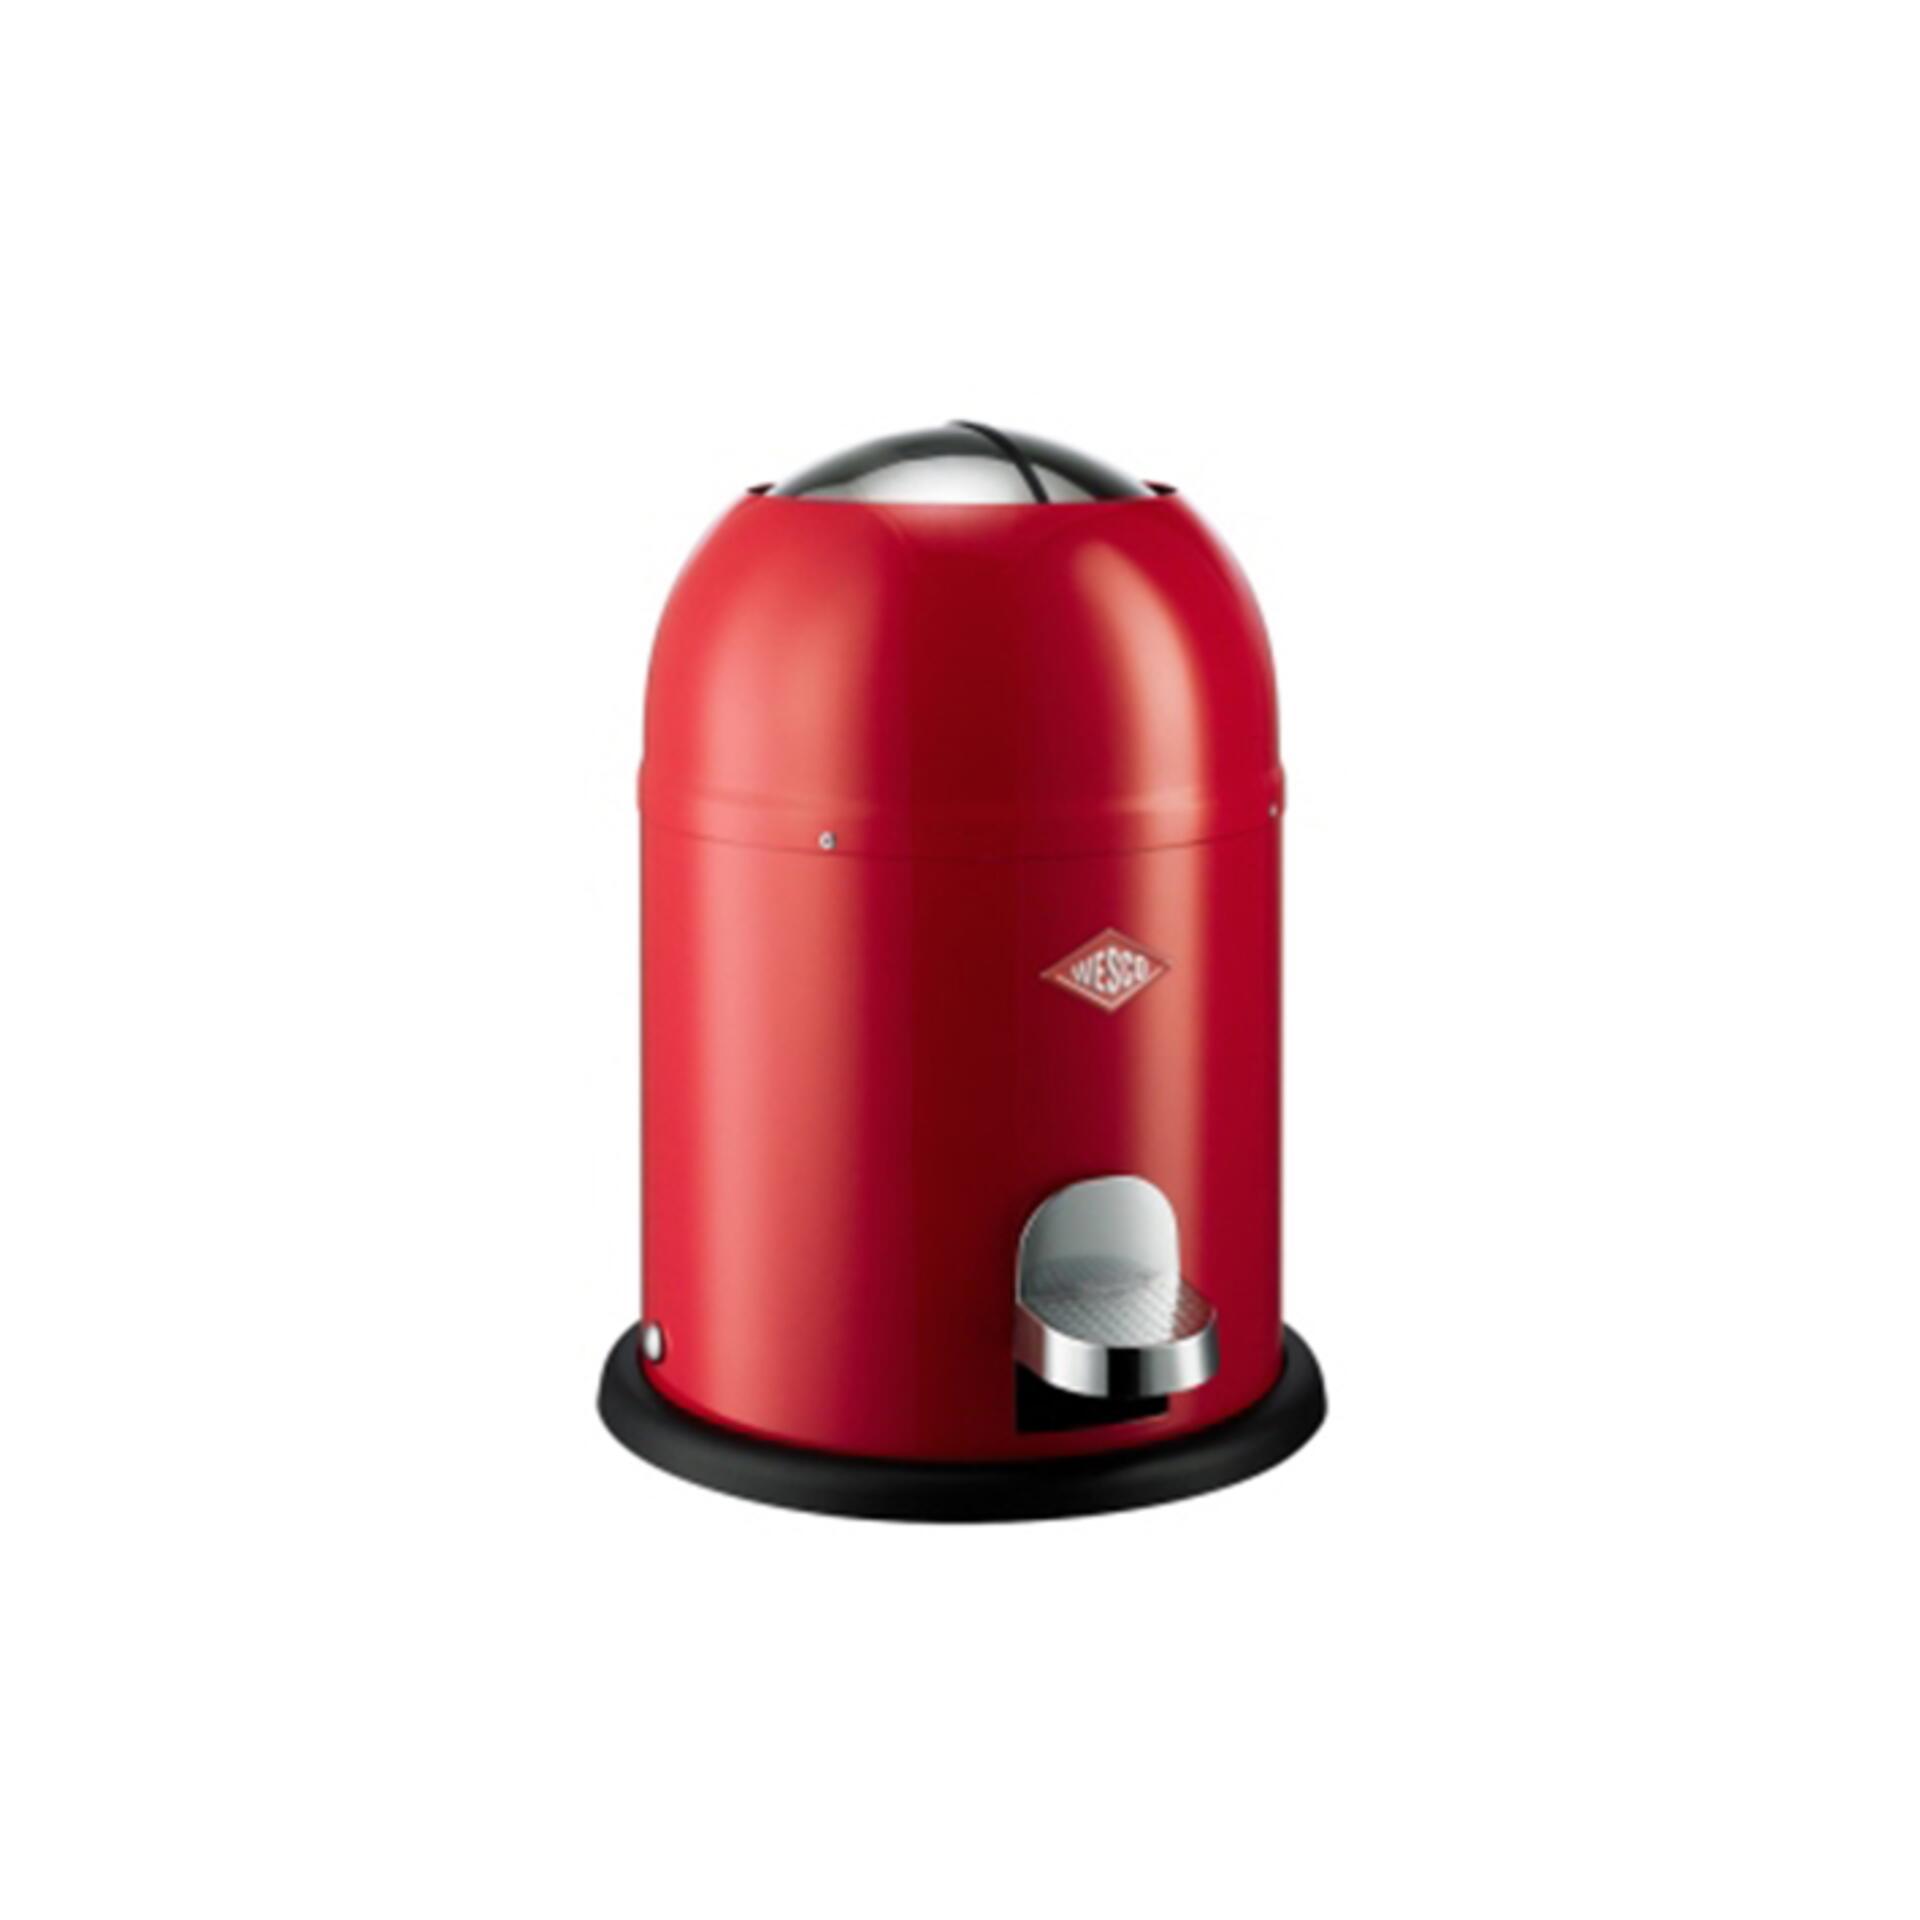 Wesco Tret-Abfalleimer Singlemaster 9 l Rot